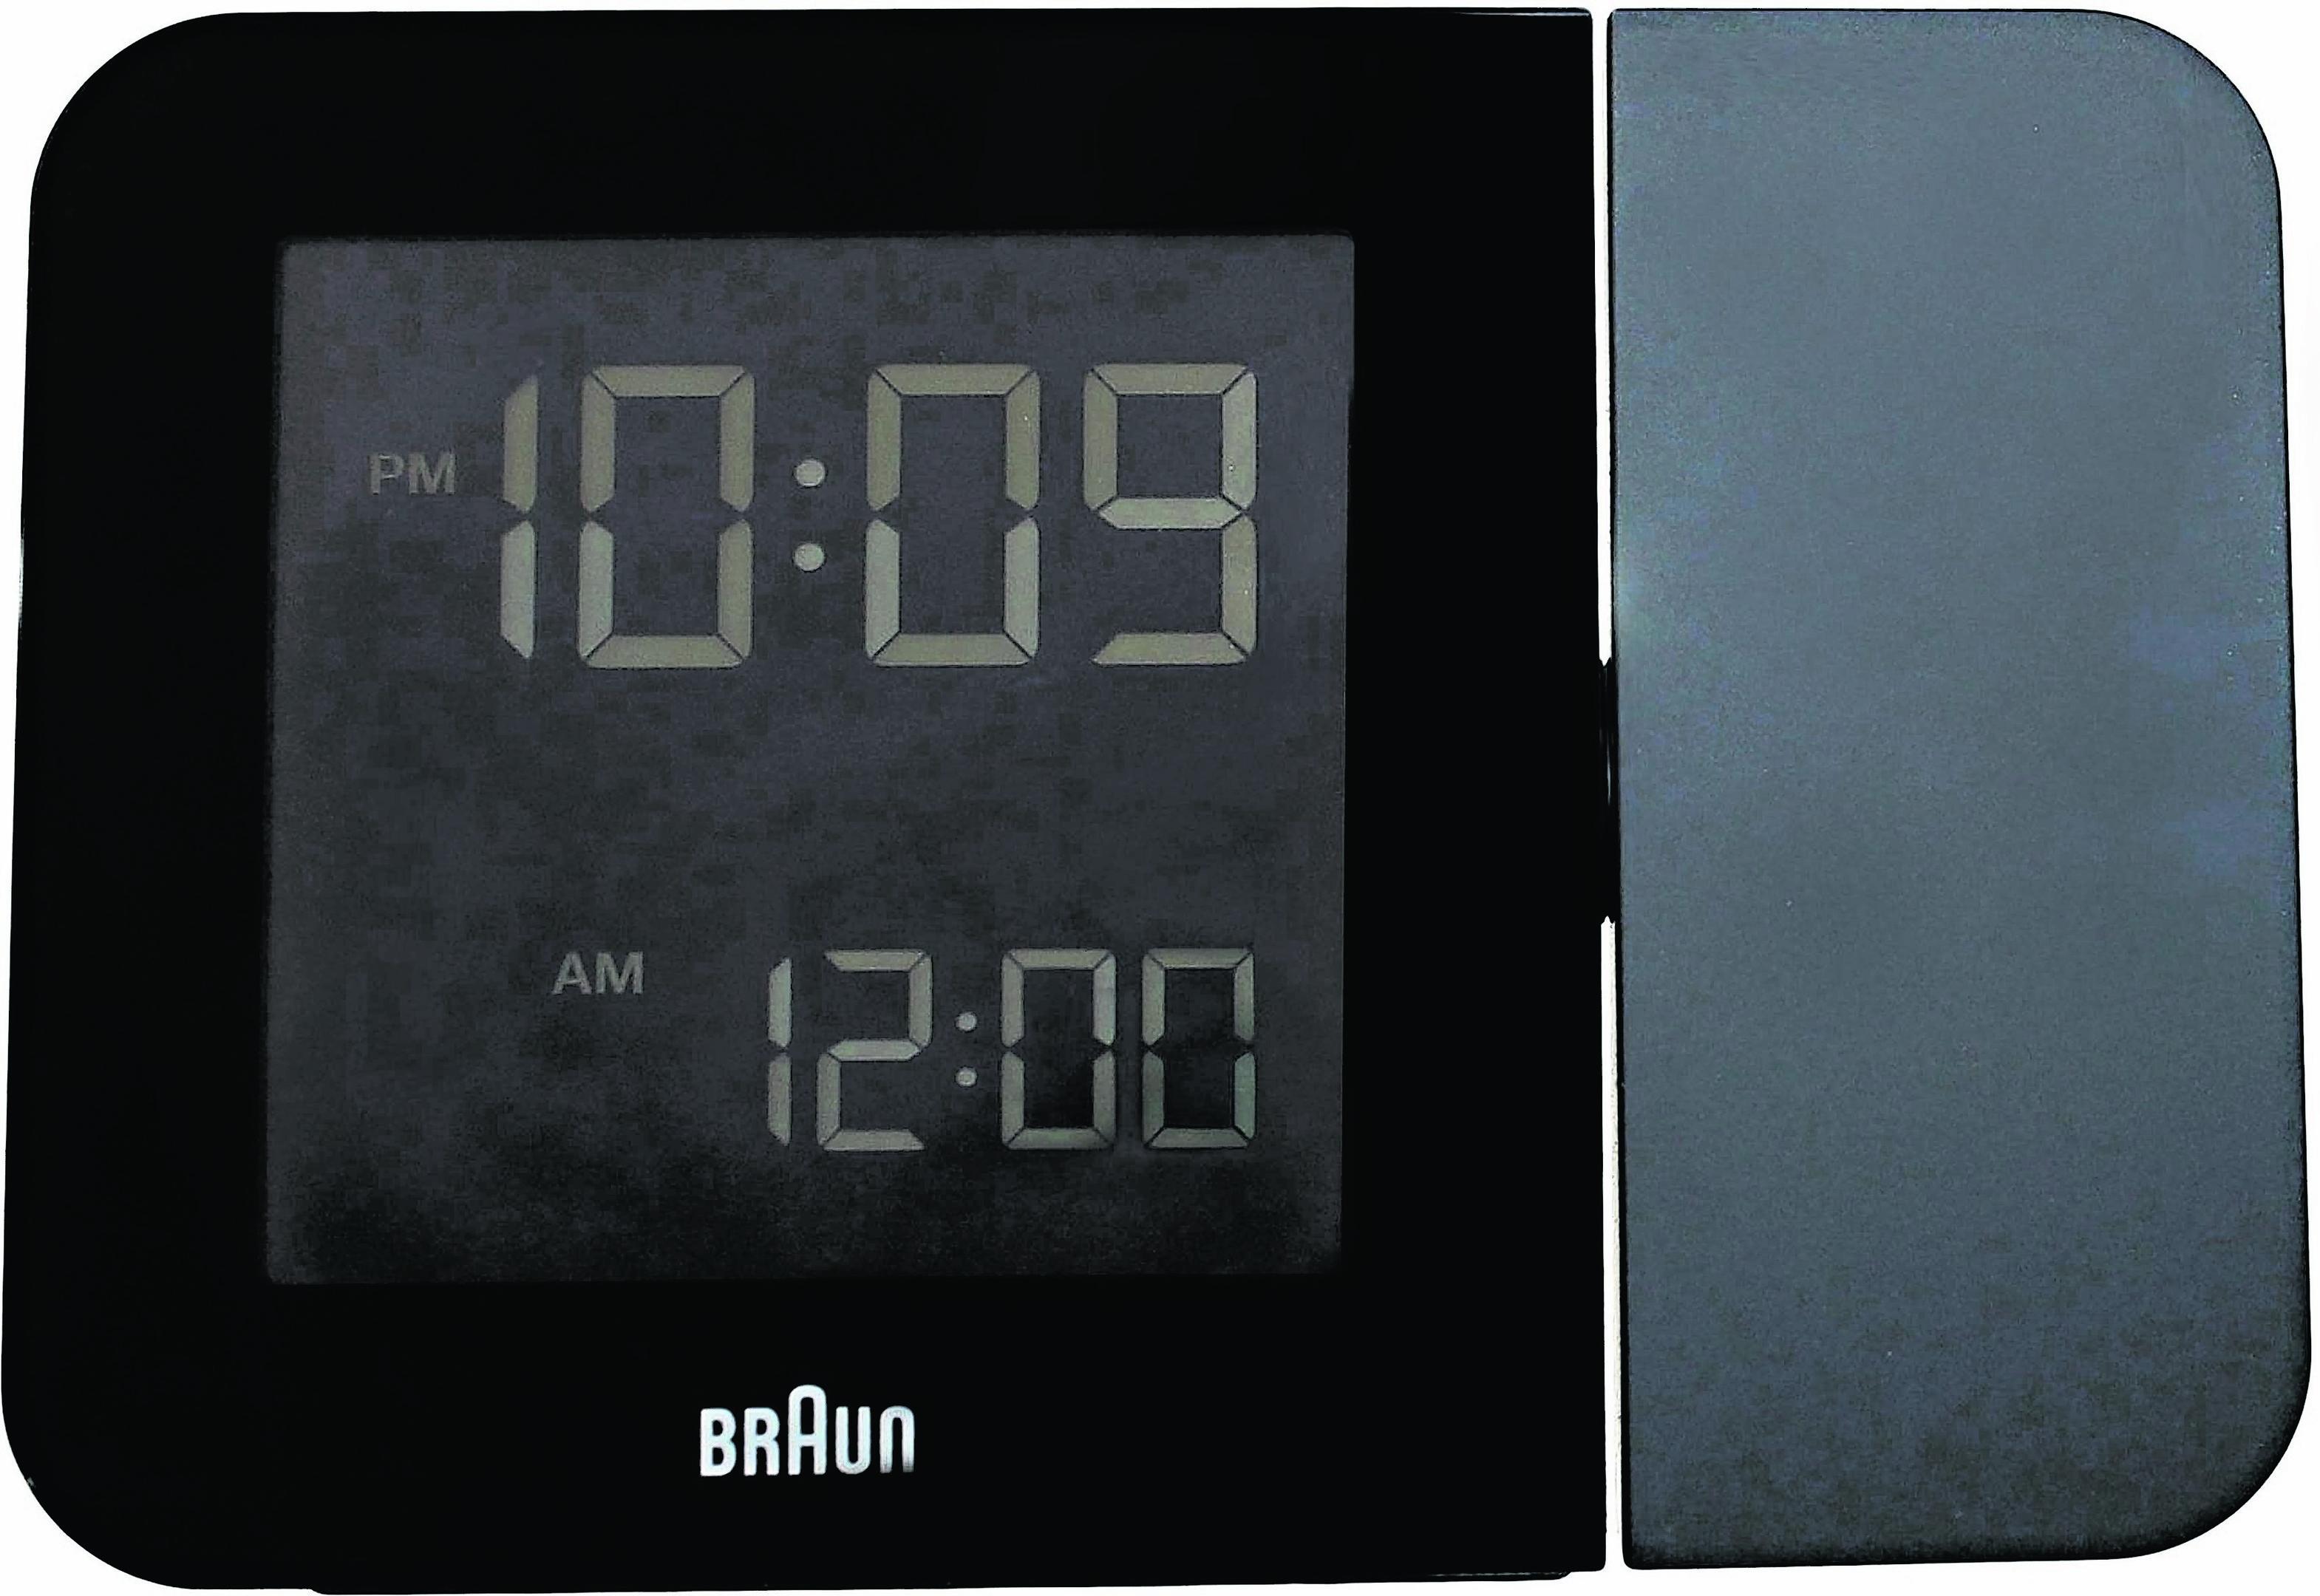 GADGETS Alarm Clocks 092345